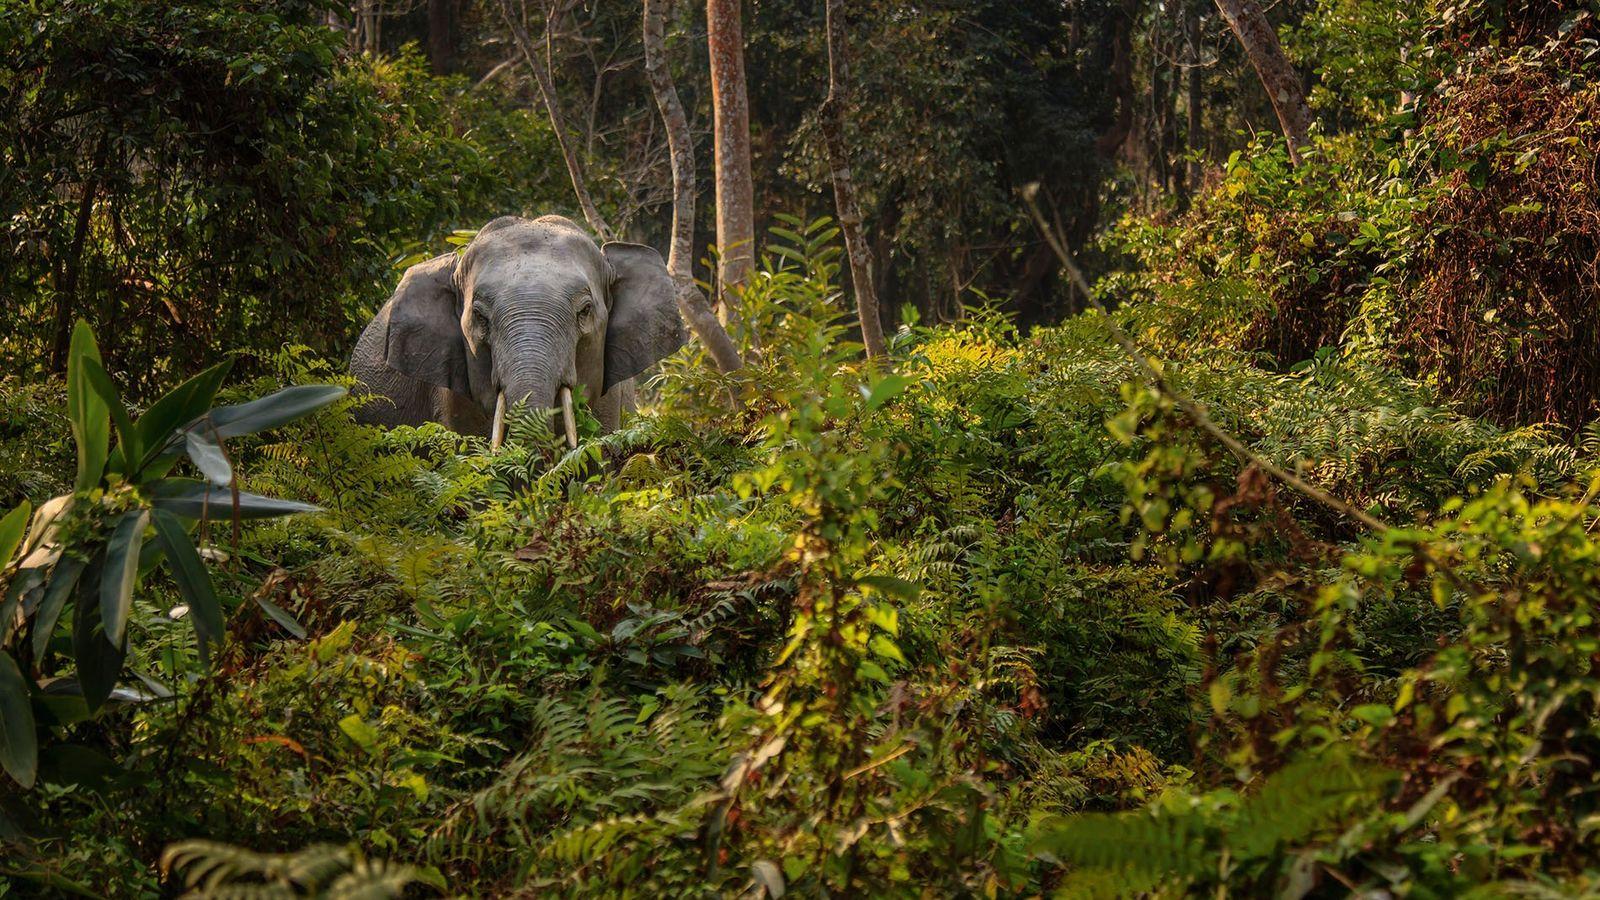 Wild Indian elephant, Kaziranga National Park and Tiger Reserve.